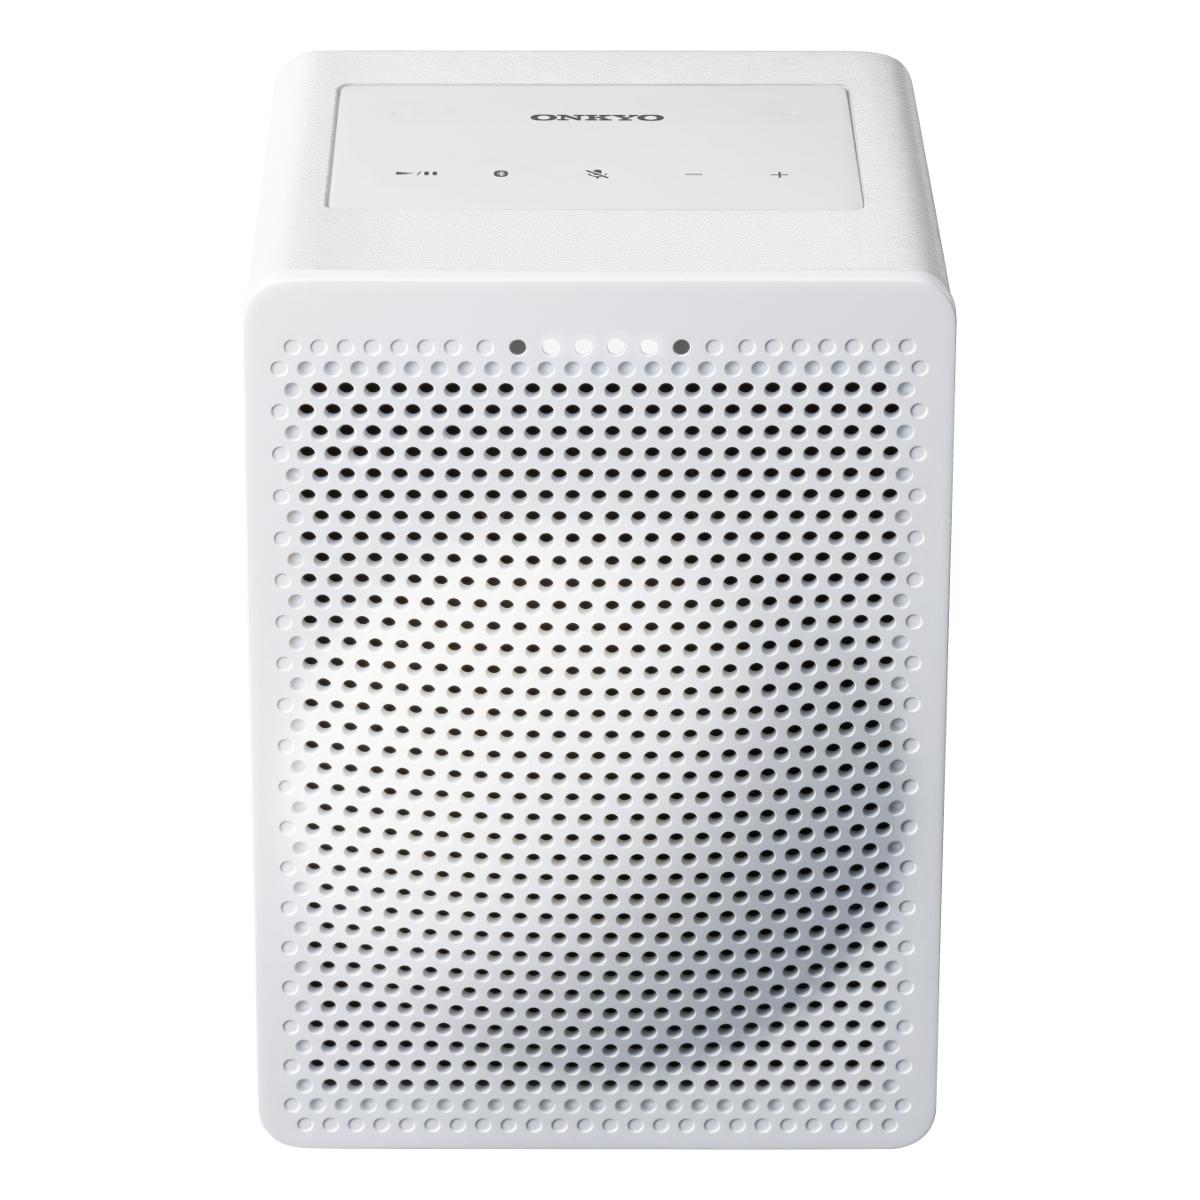 Onkyo VCGX30W Google Home Speaker - Chromecast - White